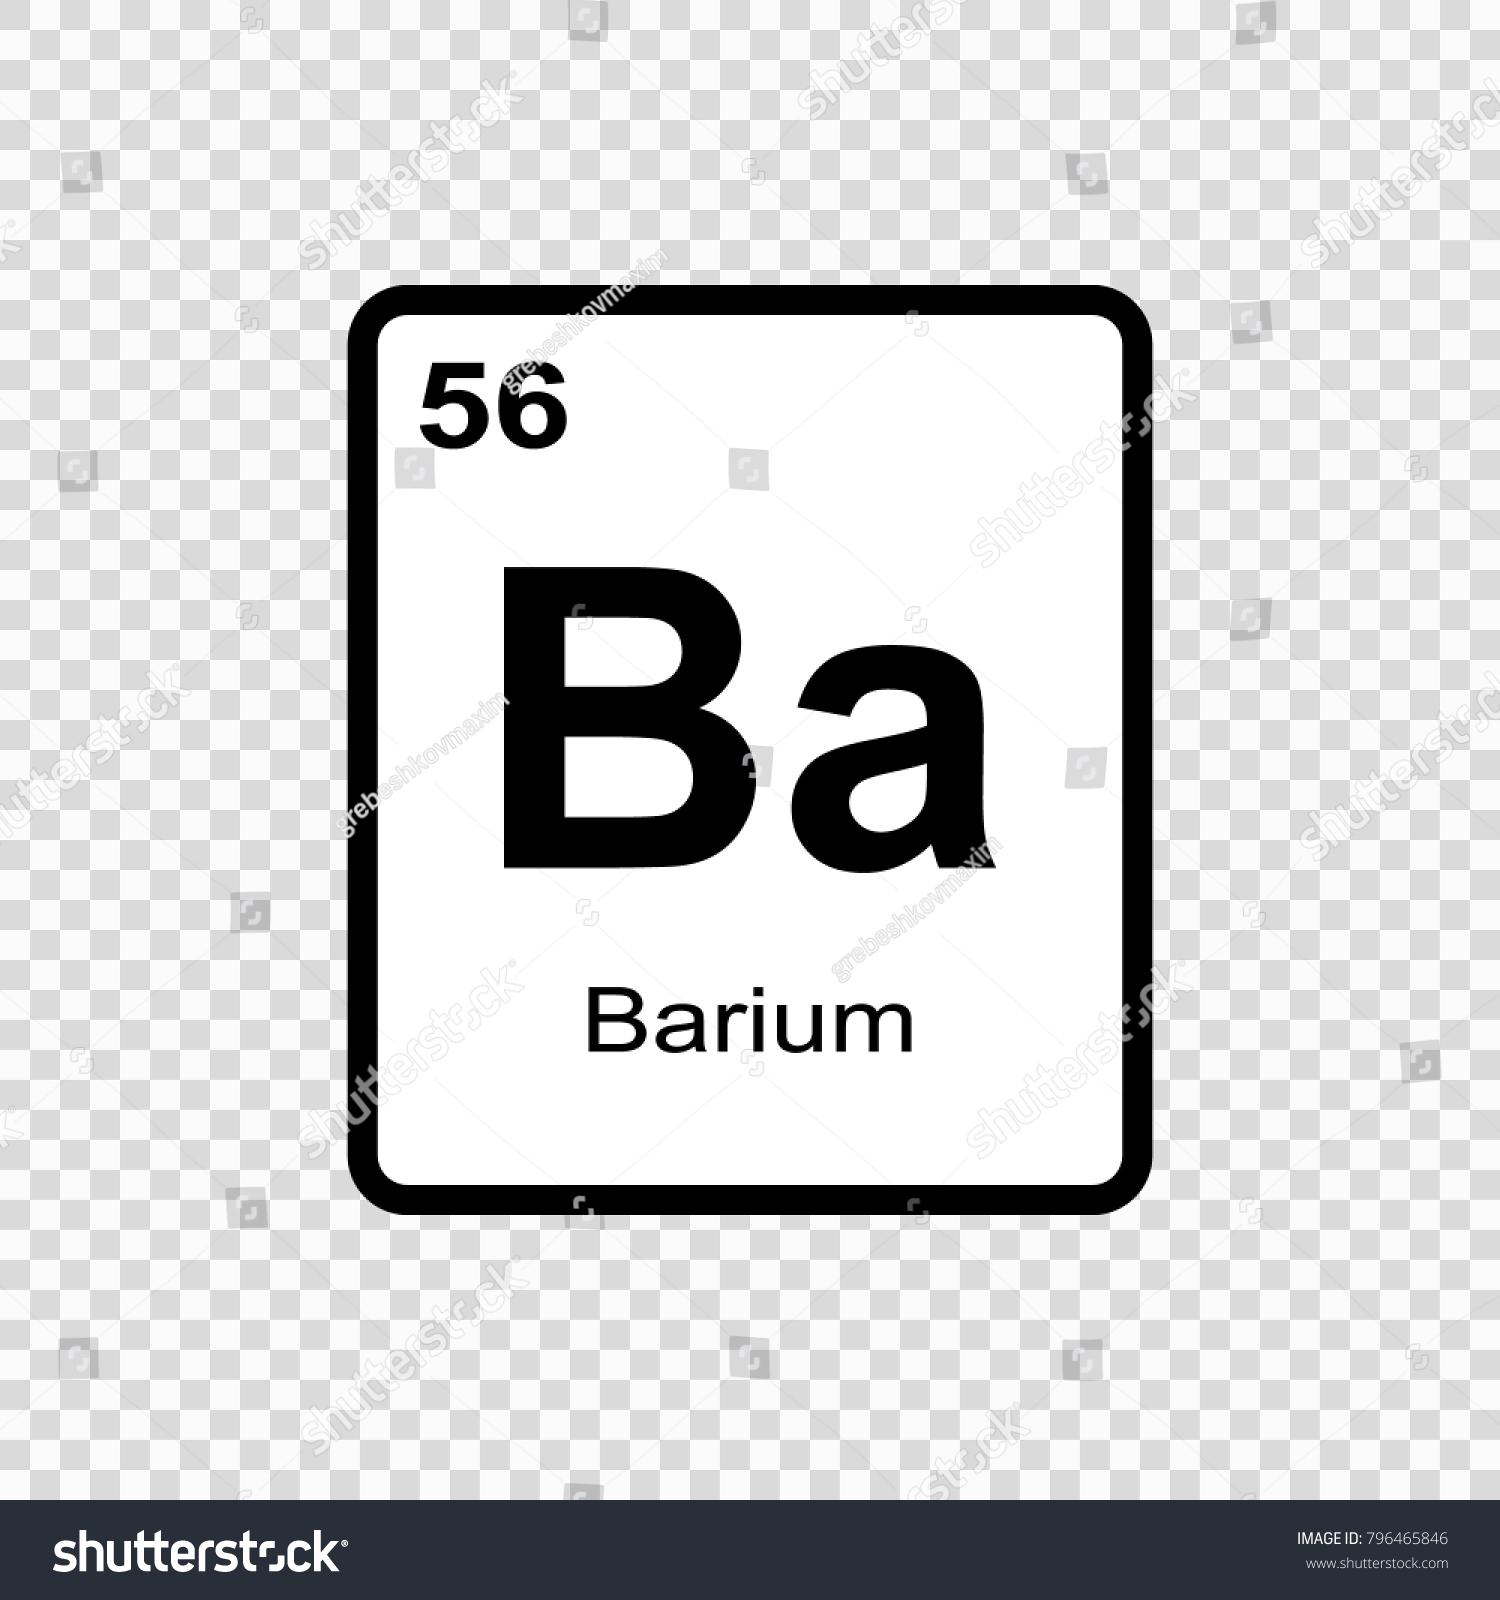 Barium chemical element sign atomic number stock vector 796465846 barium chemical element sign with atomic number chemical element of periodic table biocorpaavc Images